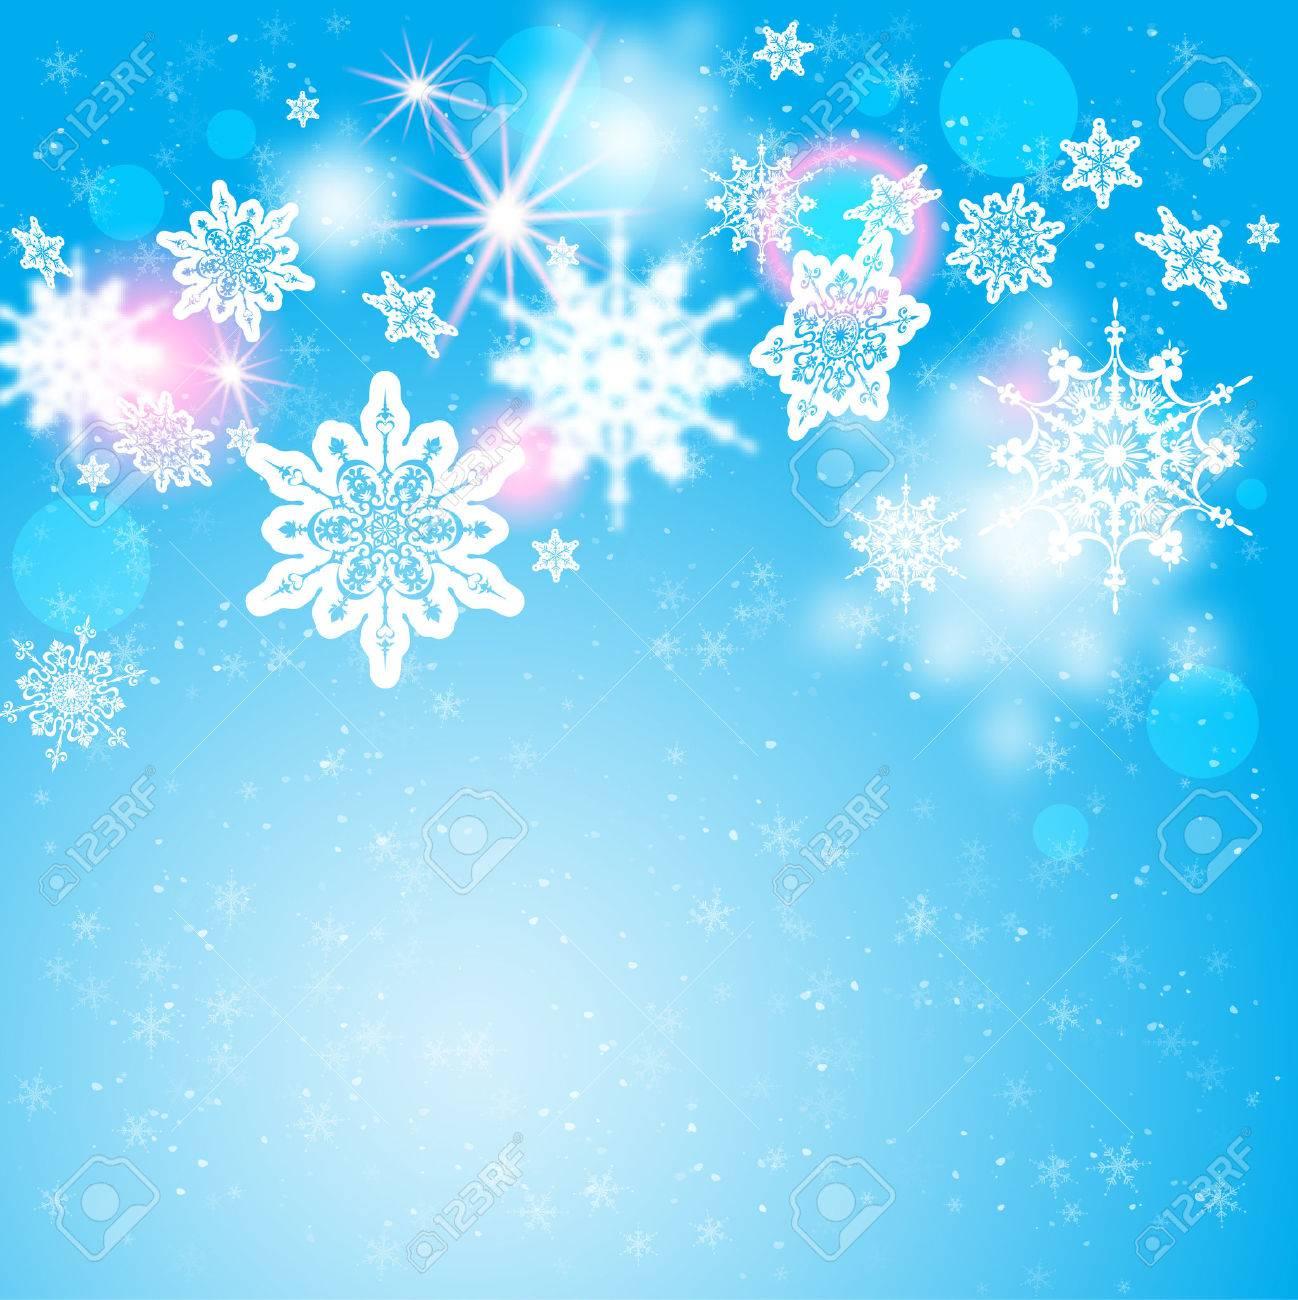 Snowflakes on blue backdrop. Holiday seasonal card - 33460846